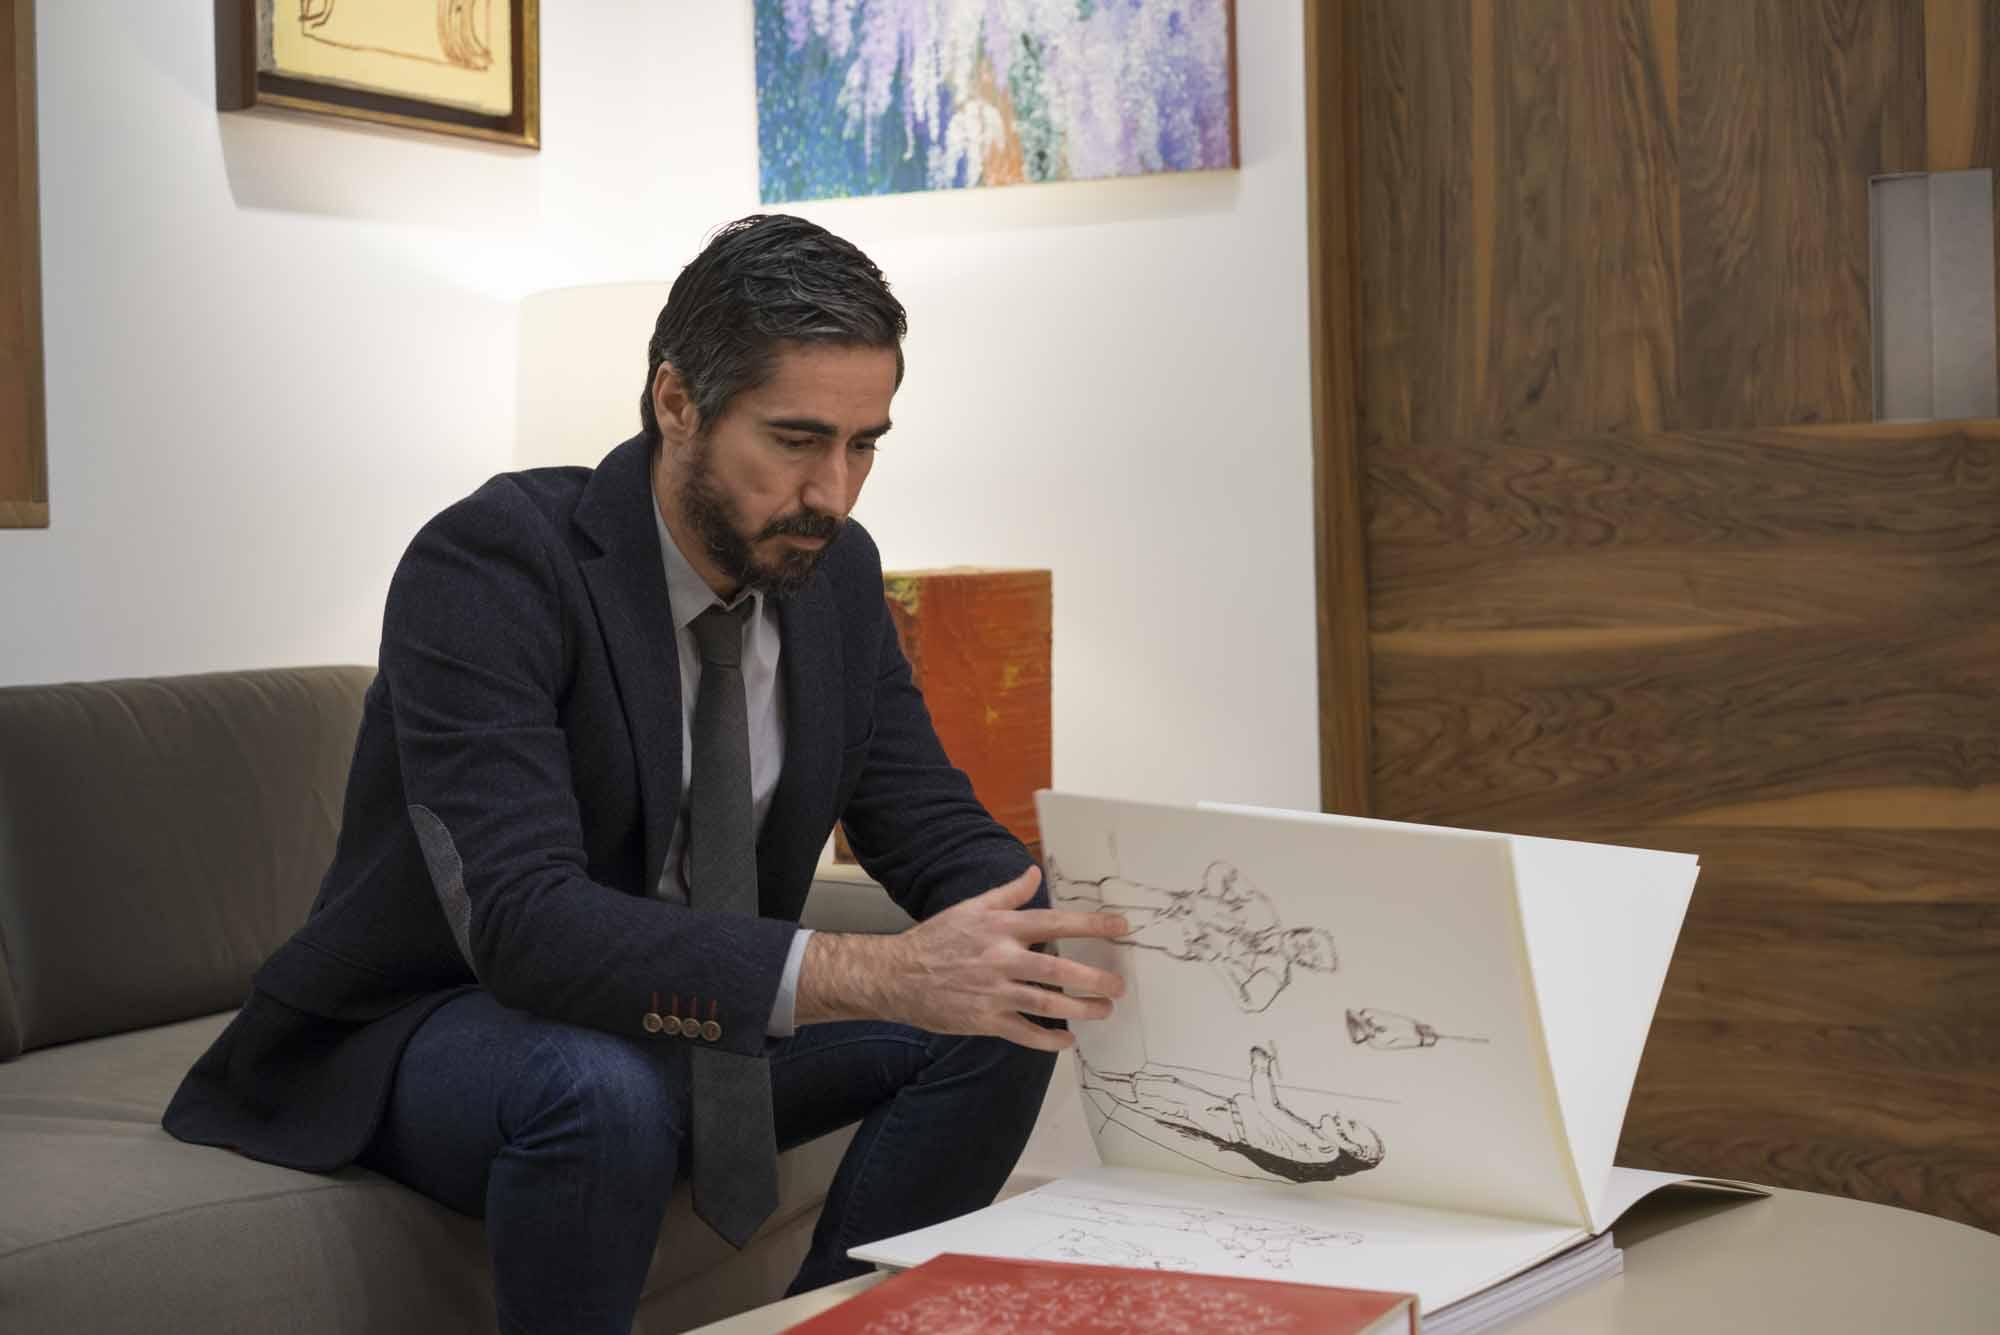 Manuel Fernández-Braso